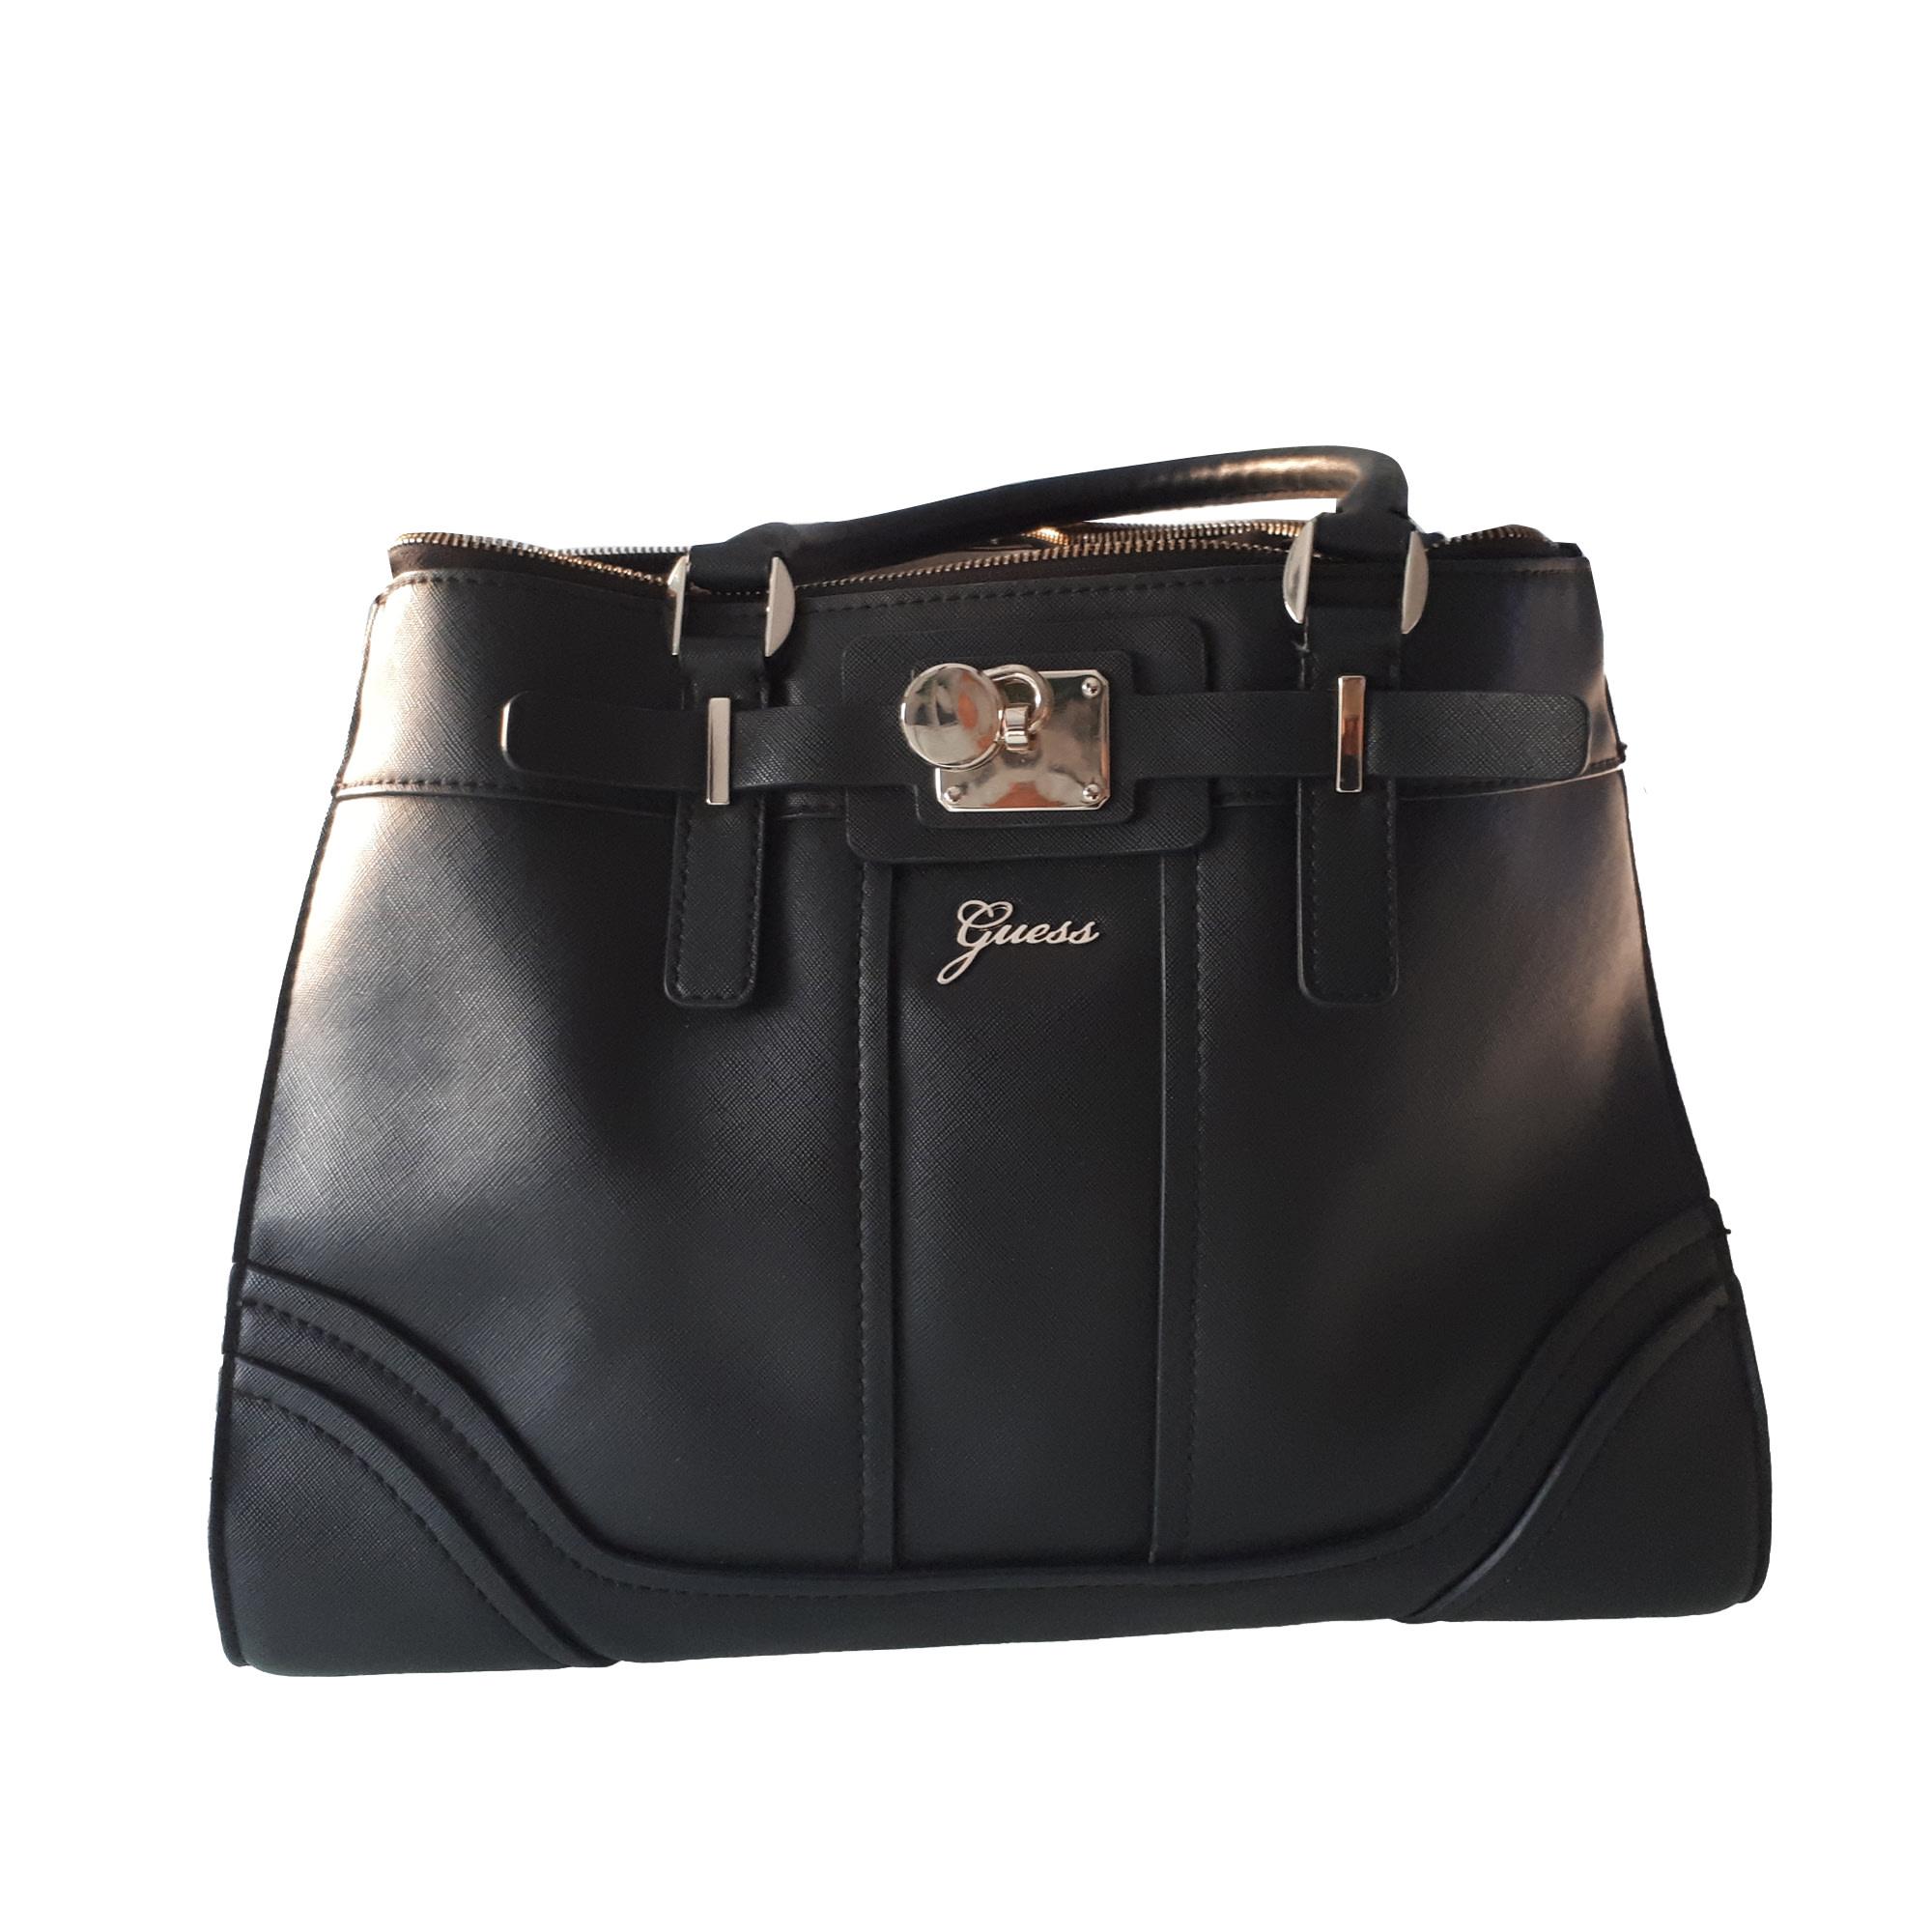 Leather Handbag GUESS Black